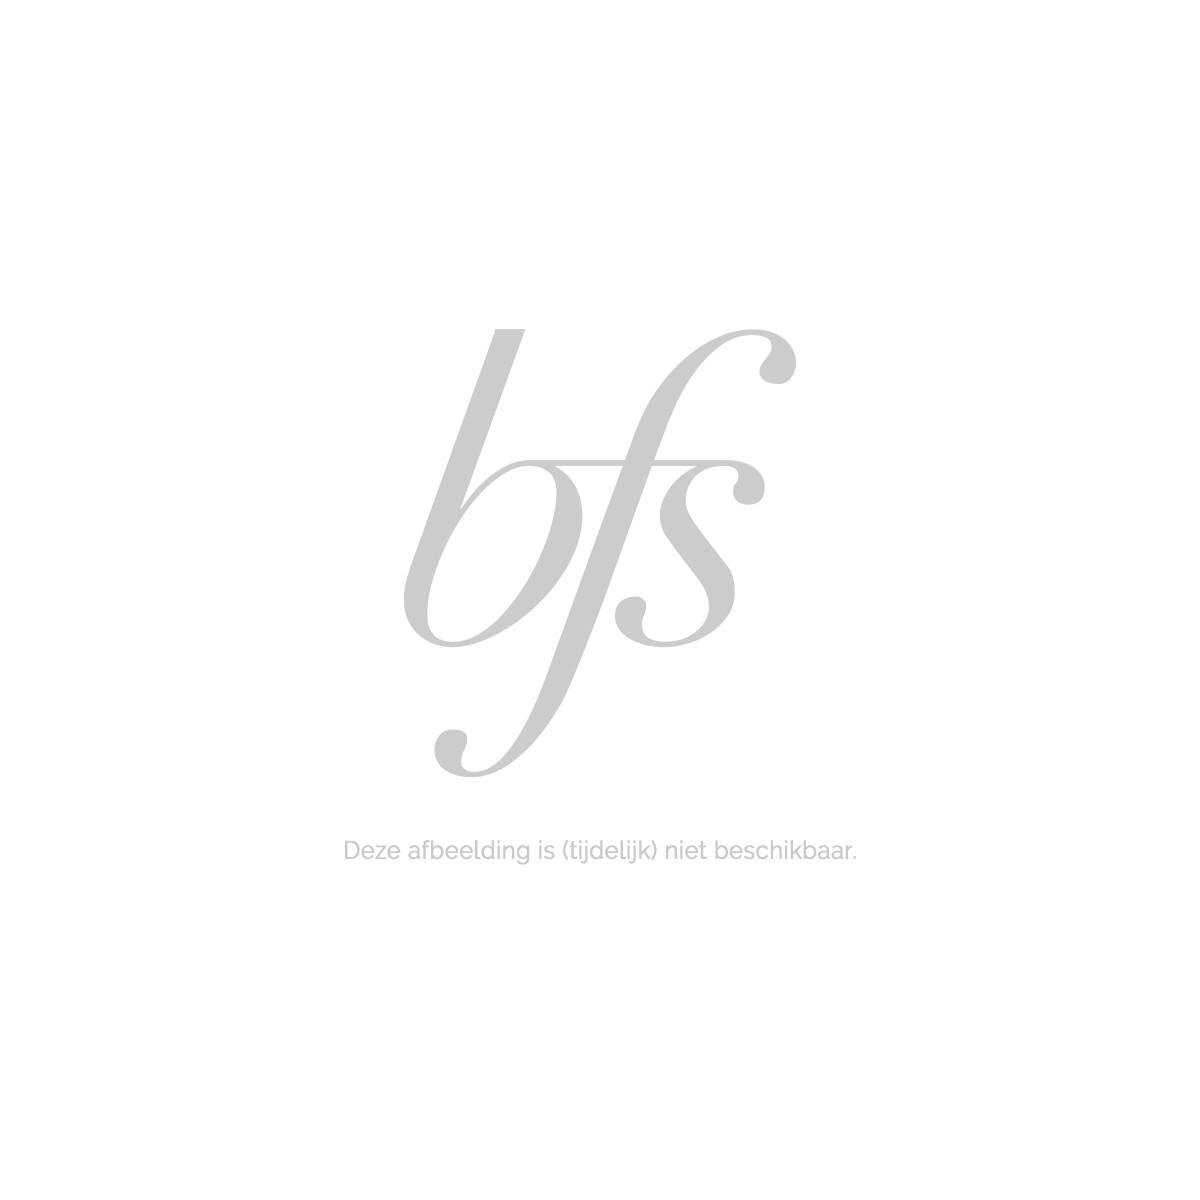 Darphin Melaperfect Foundation 01 Ivory Spf15